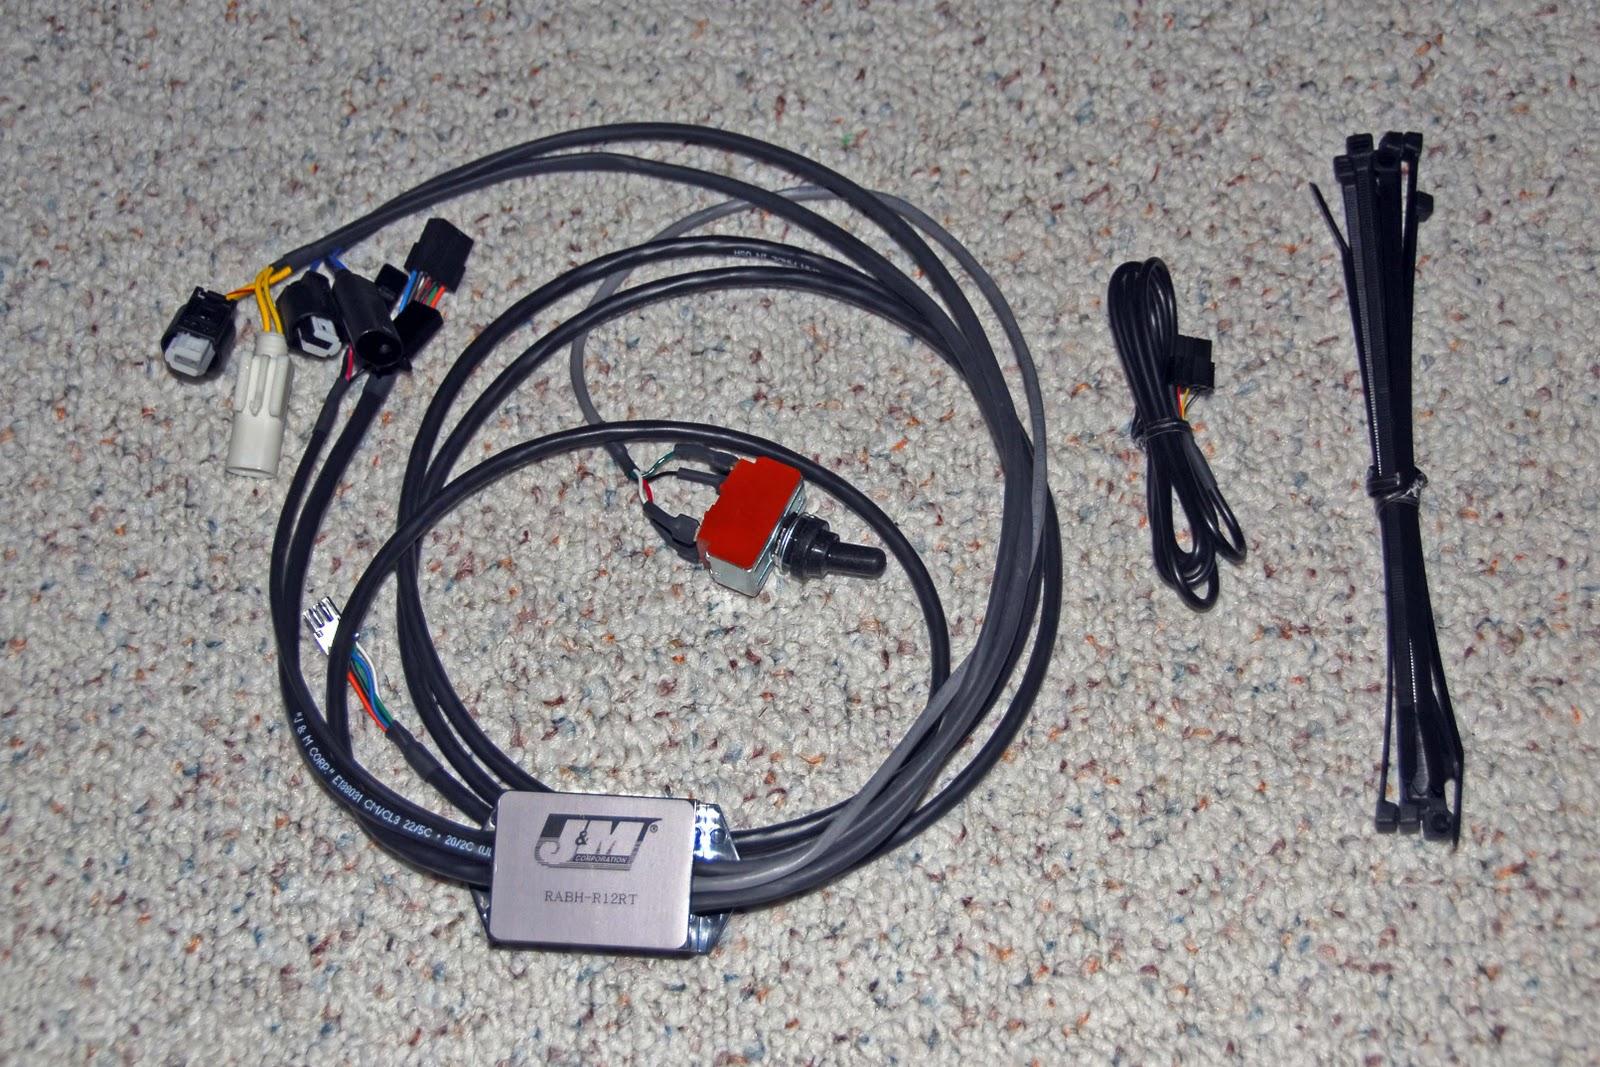 Blaines 2010 R1200rt Wire Harness Schematic Zumo 665 Adapter